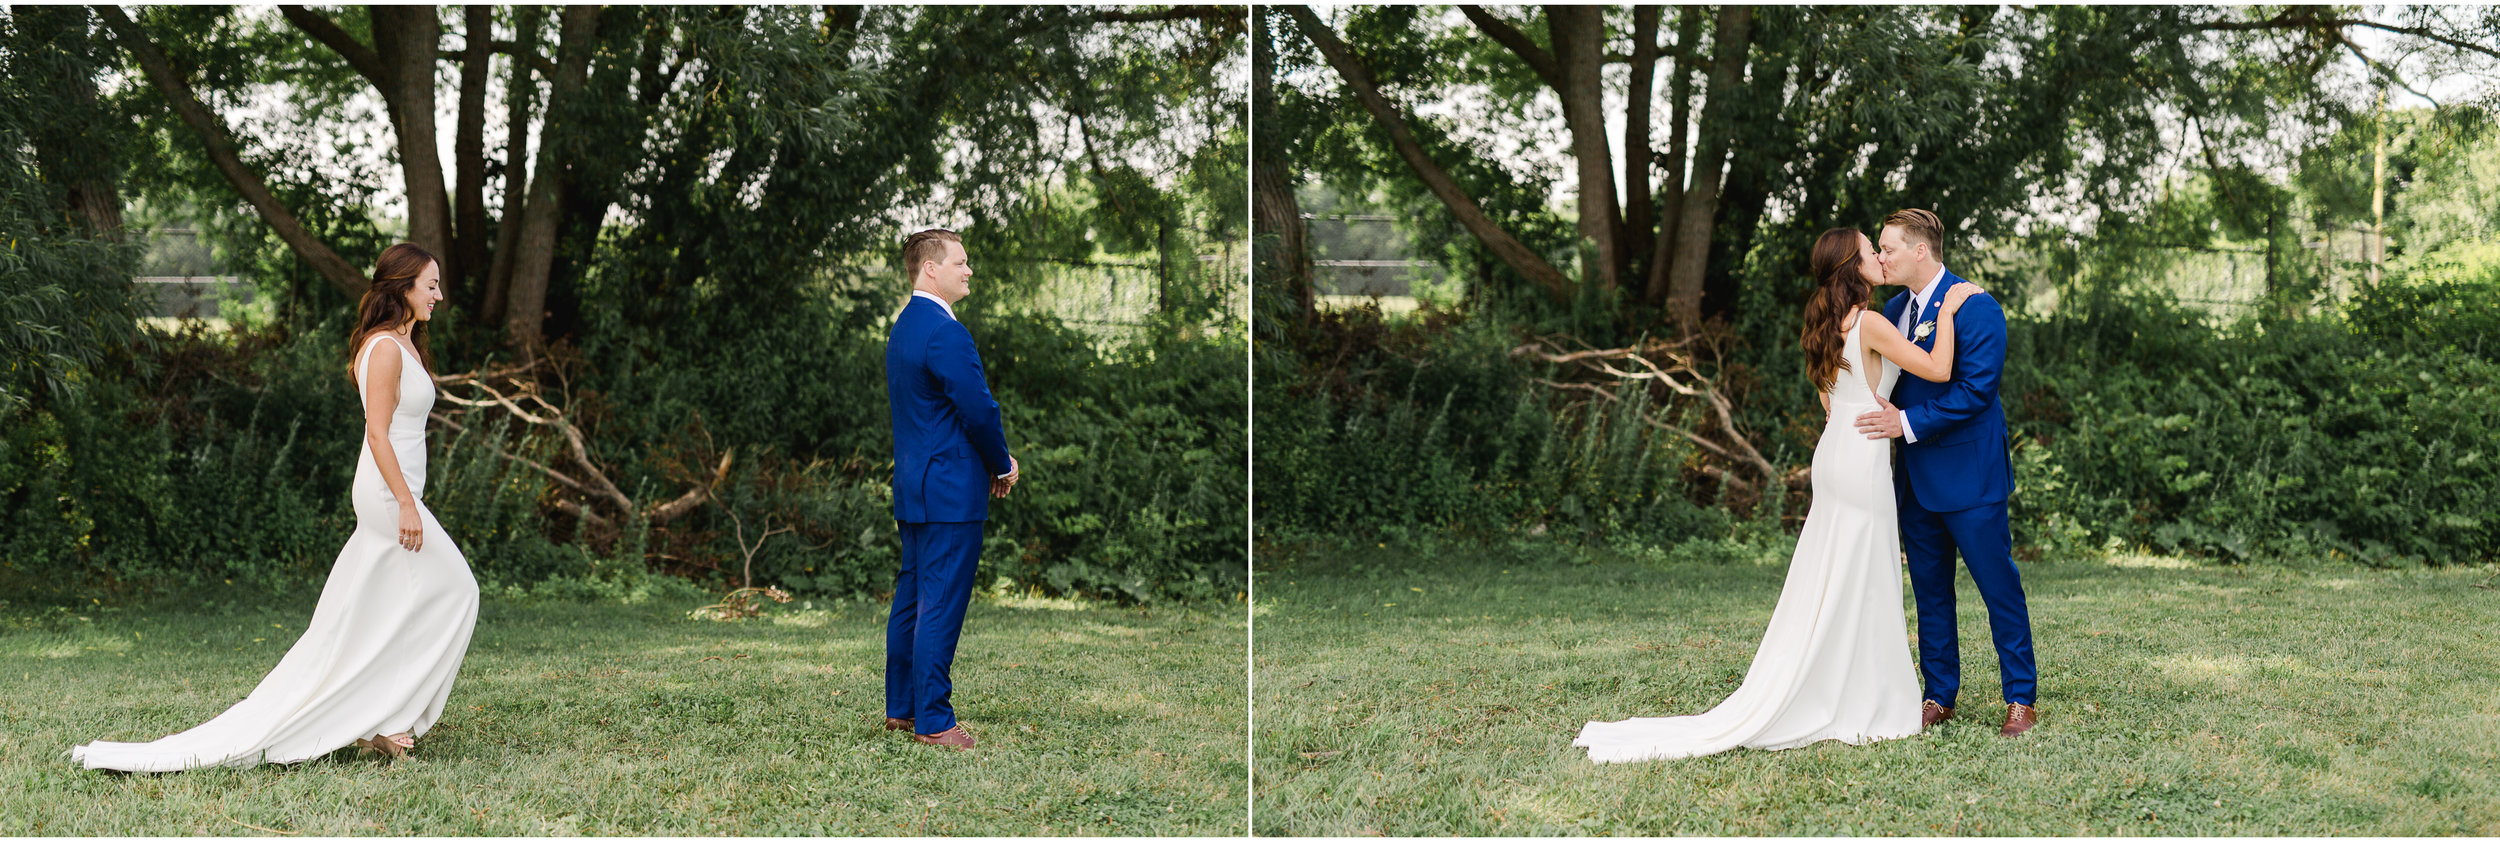 Portland, Maine Wedding at Brick South 9.jpg